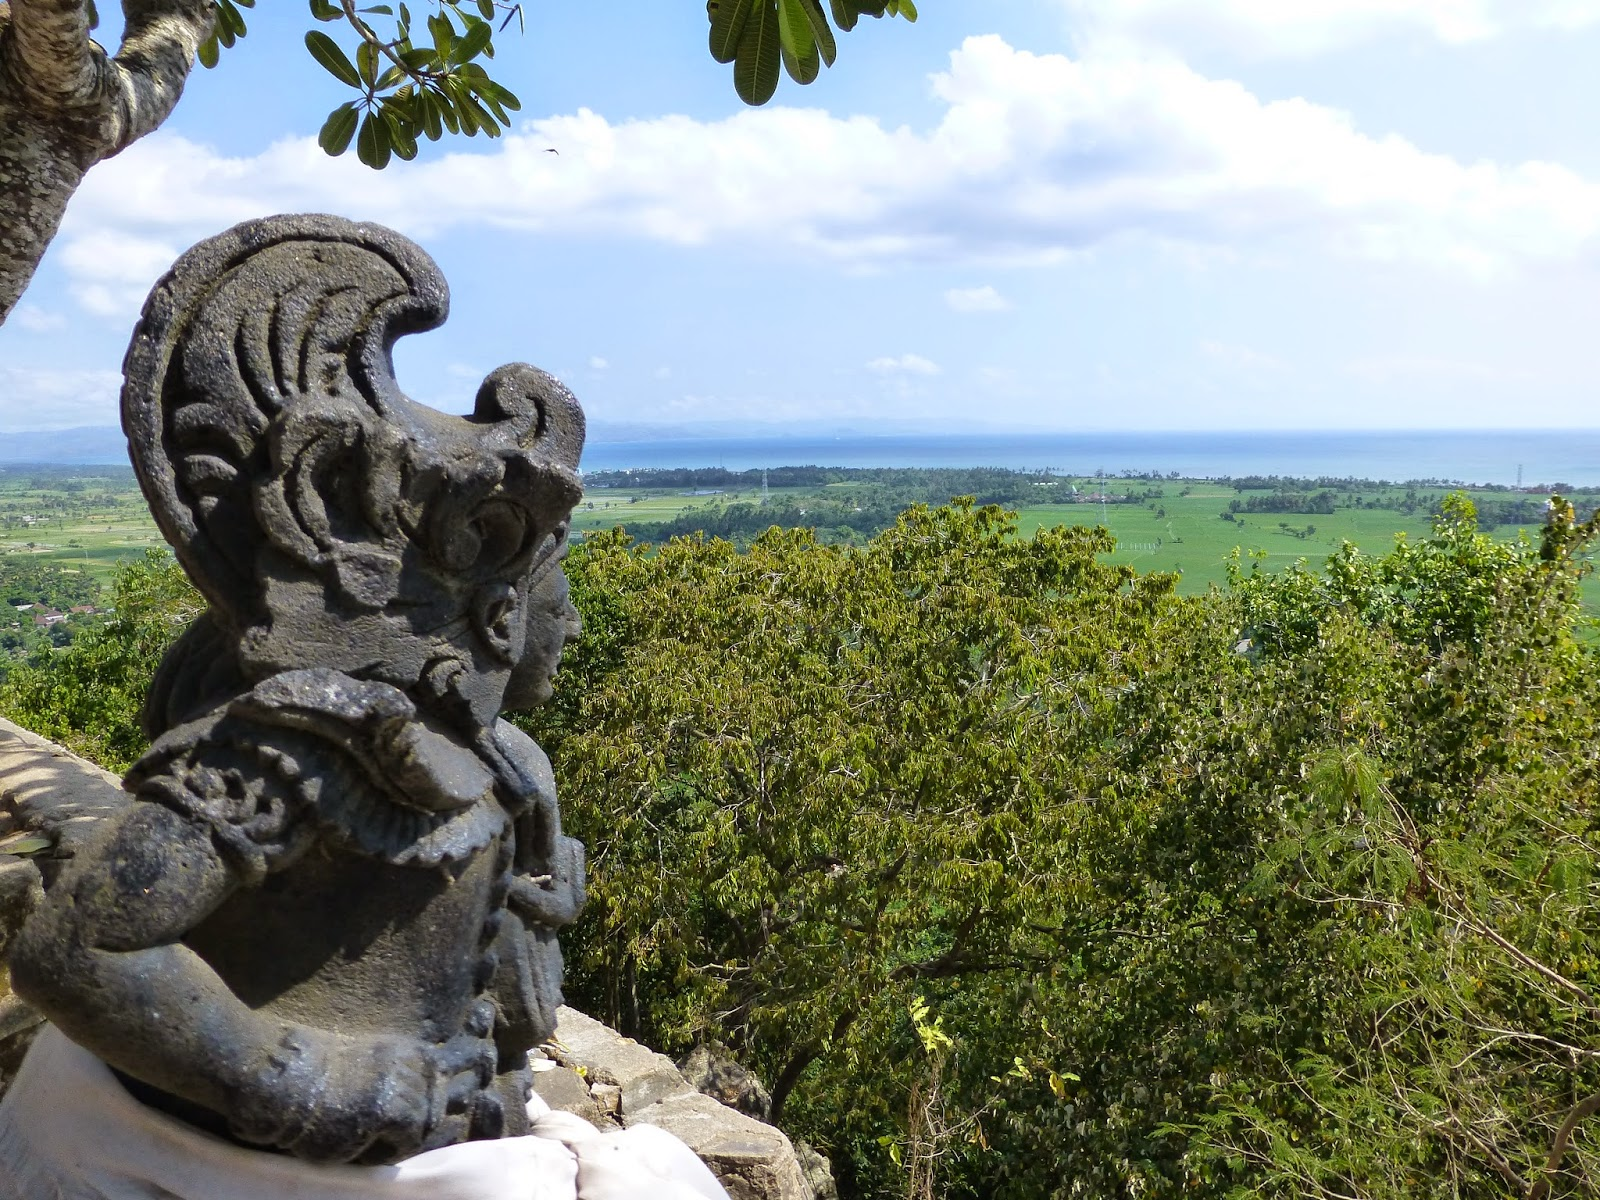 Pura Diatas Pegunungan Lombok Gunung Pensong Pengsong Kabupaten Barat Kab